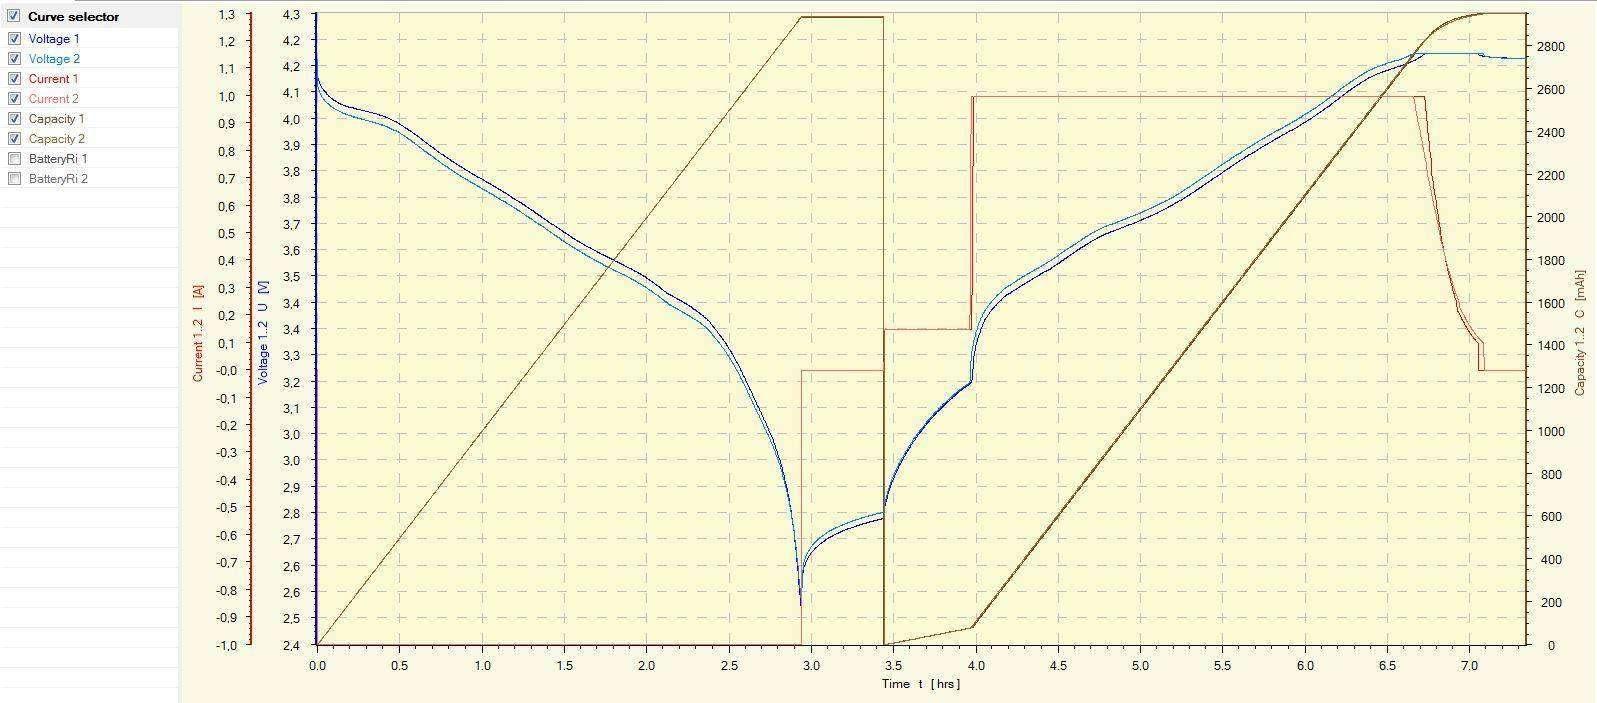 GearBest: Обзор и тестирование Li - ion аккумуляторов 18650 LG HG2 3000mAh, 20A